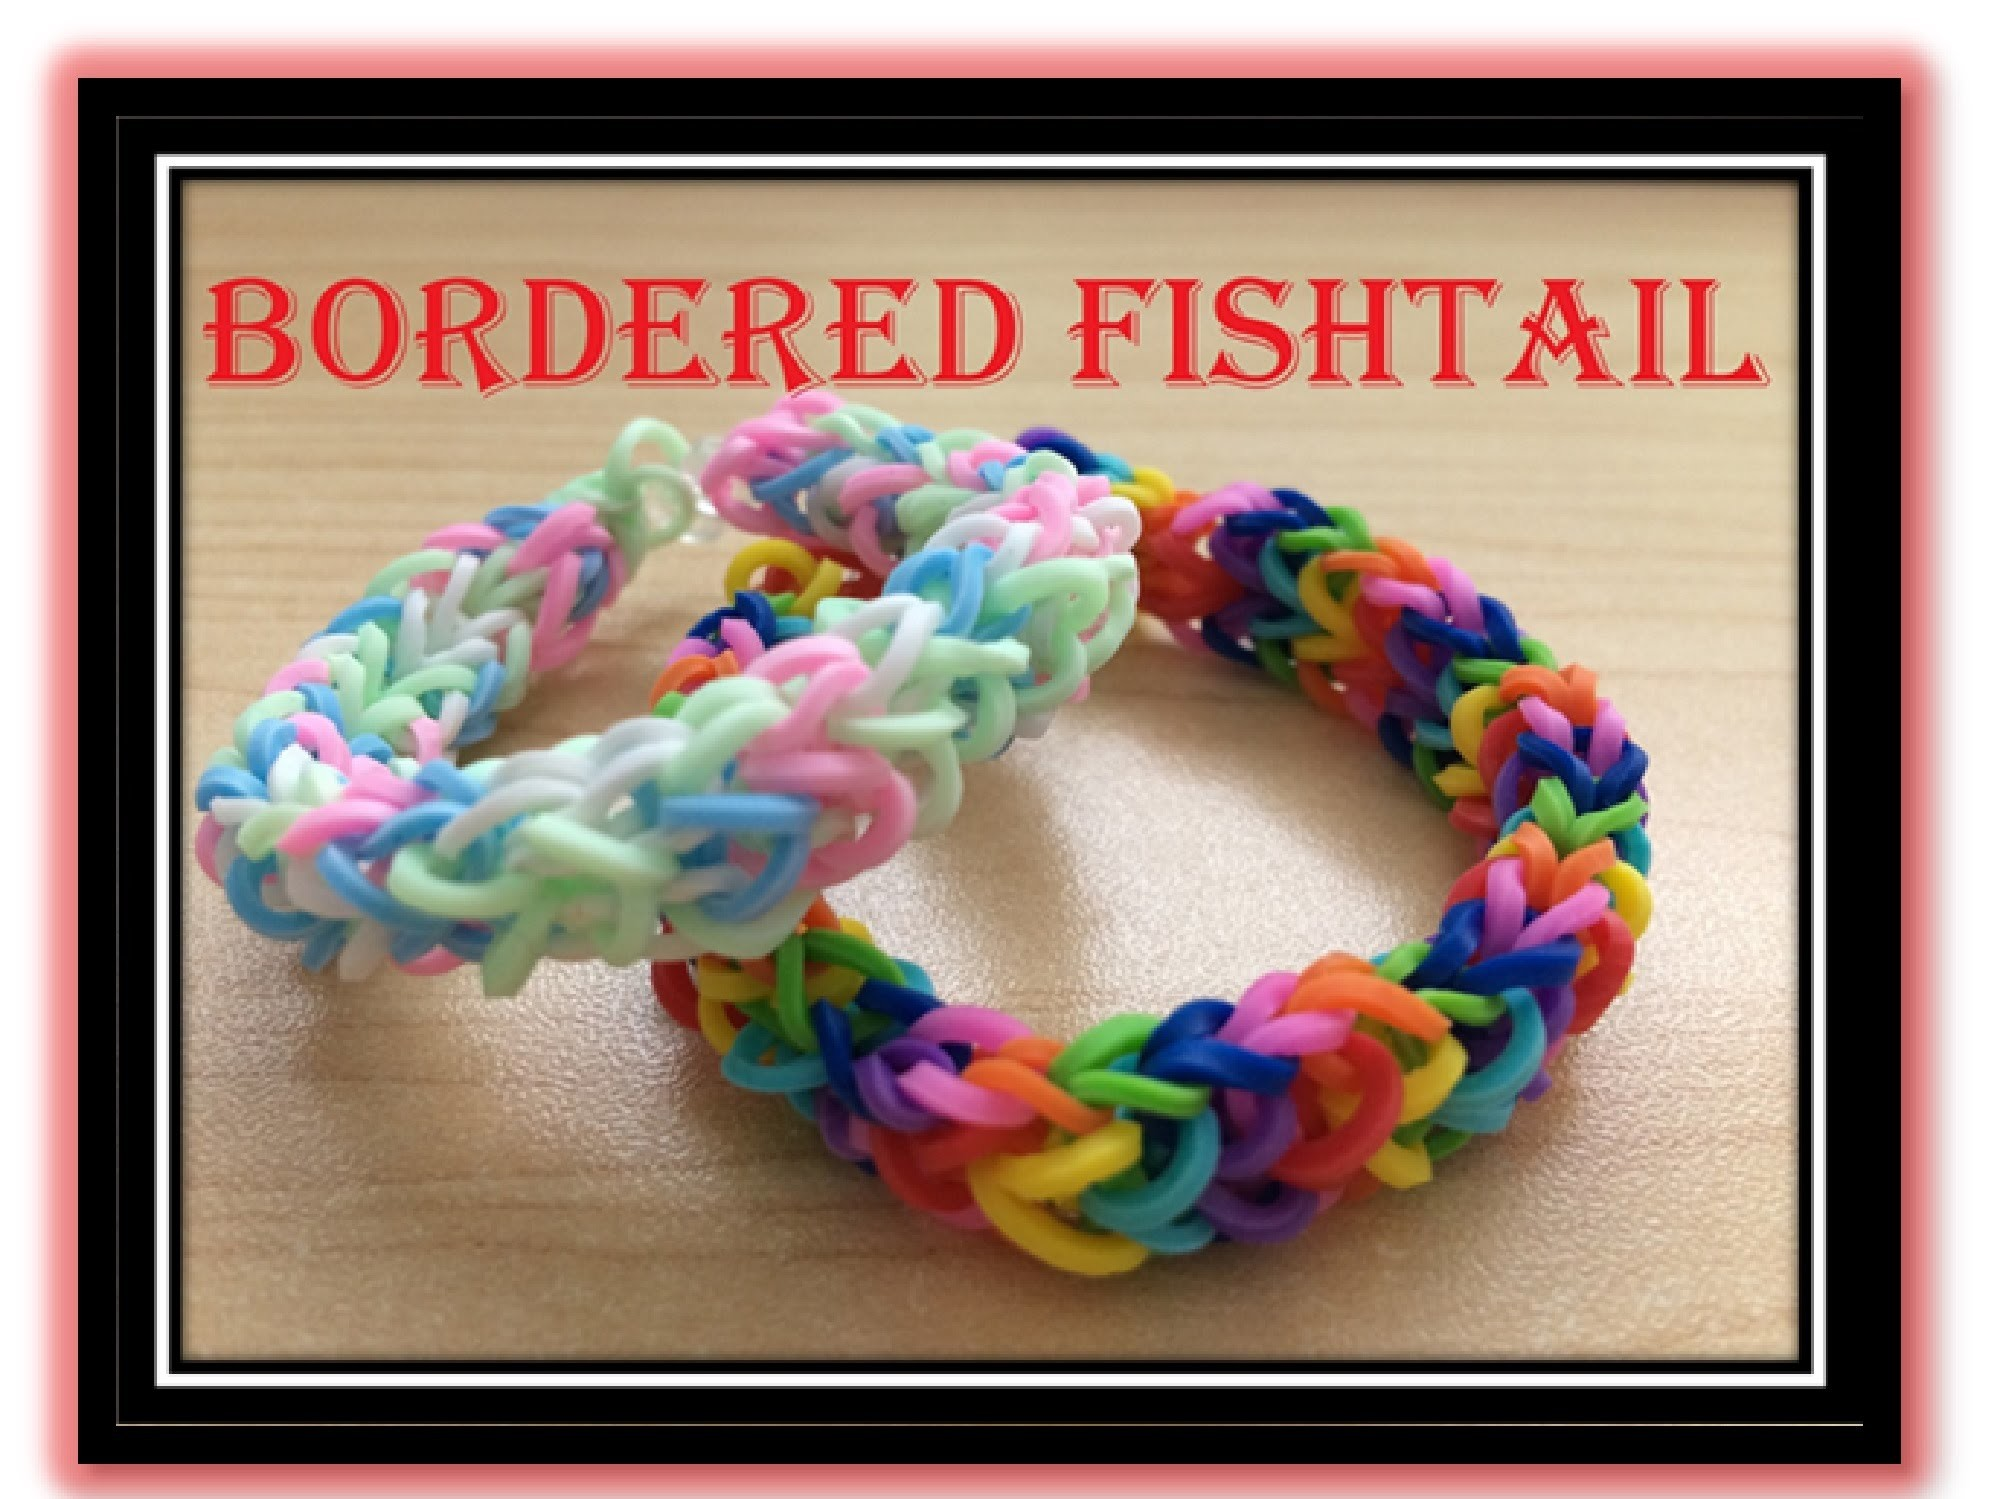 Bordered Fishtail Loom Bracelet Tutorial